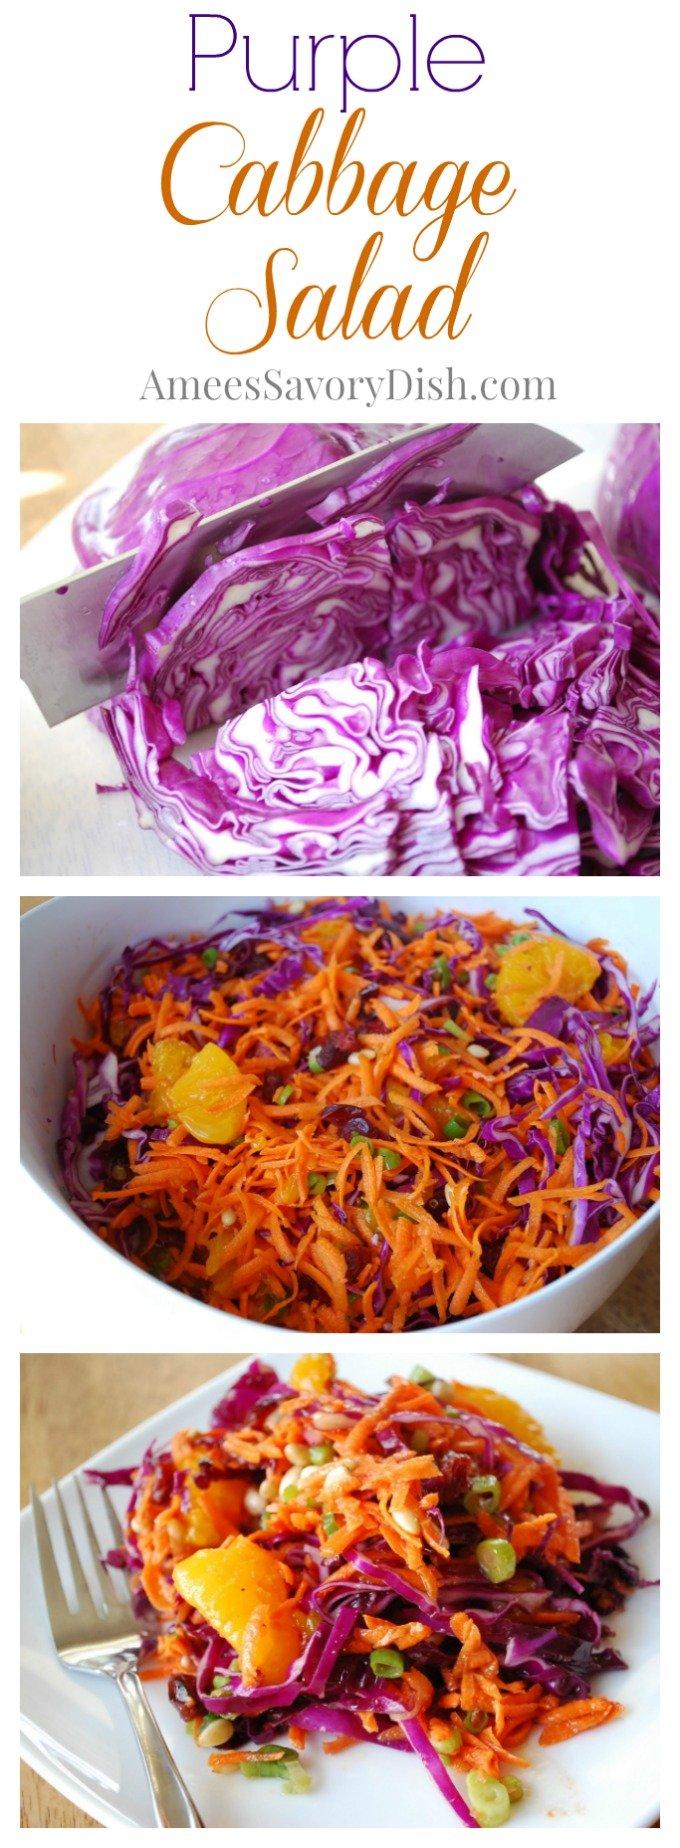 purple cabbage salad recipe